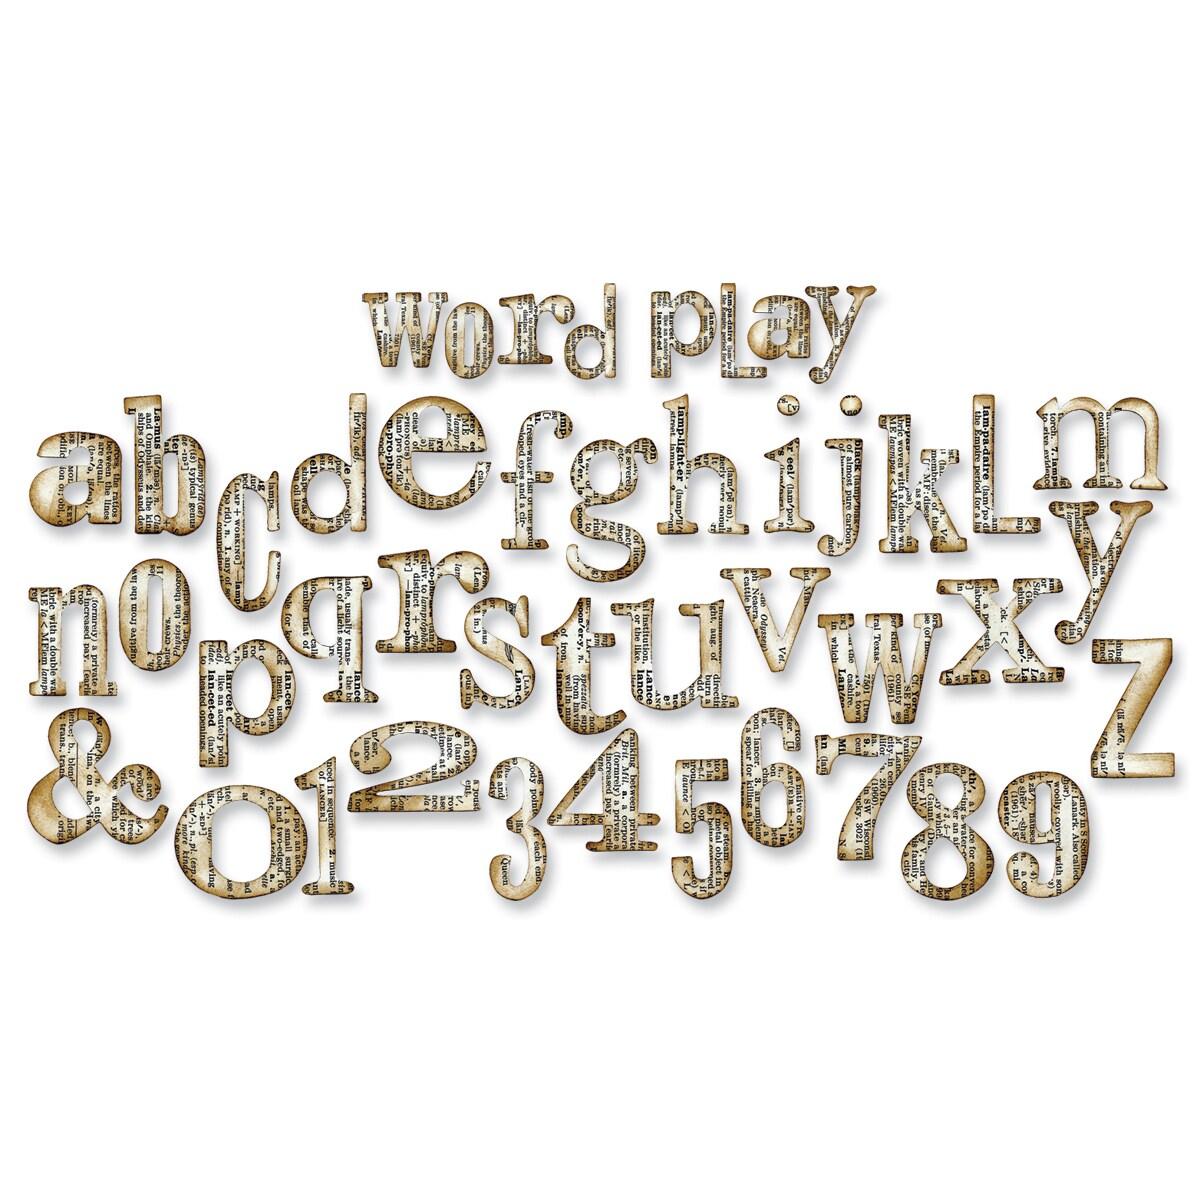 Sizzix Bigz XL Alphabet Cutting Embossing Die By Tim Holtz - Word Play